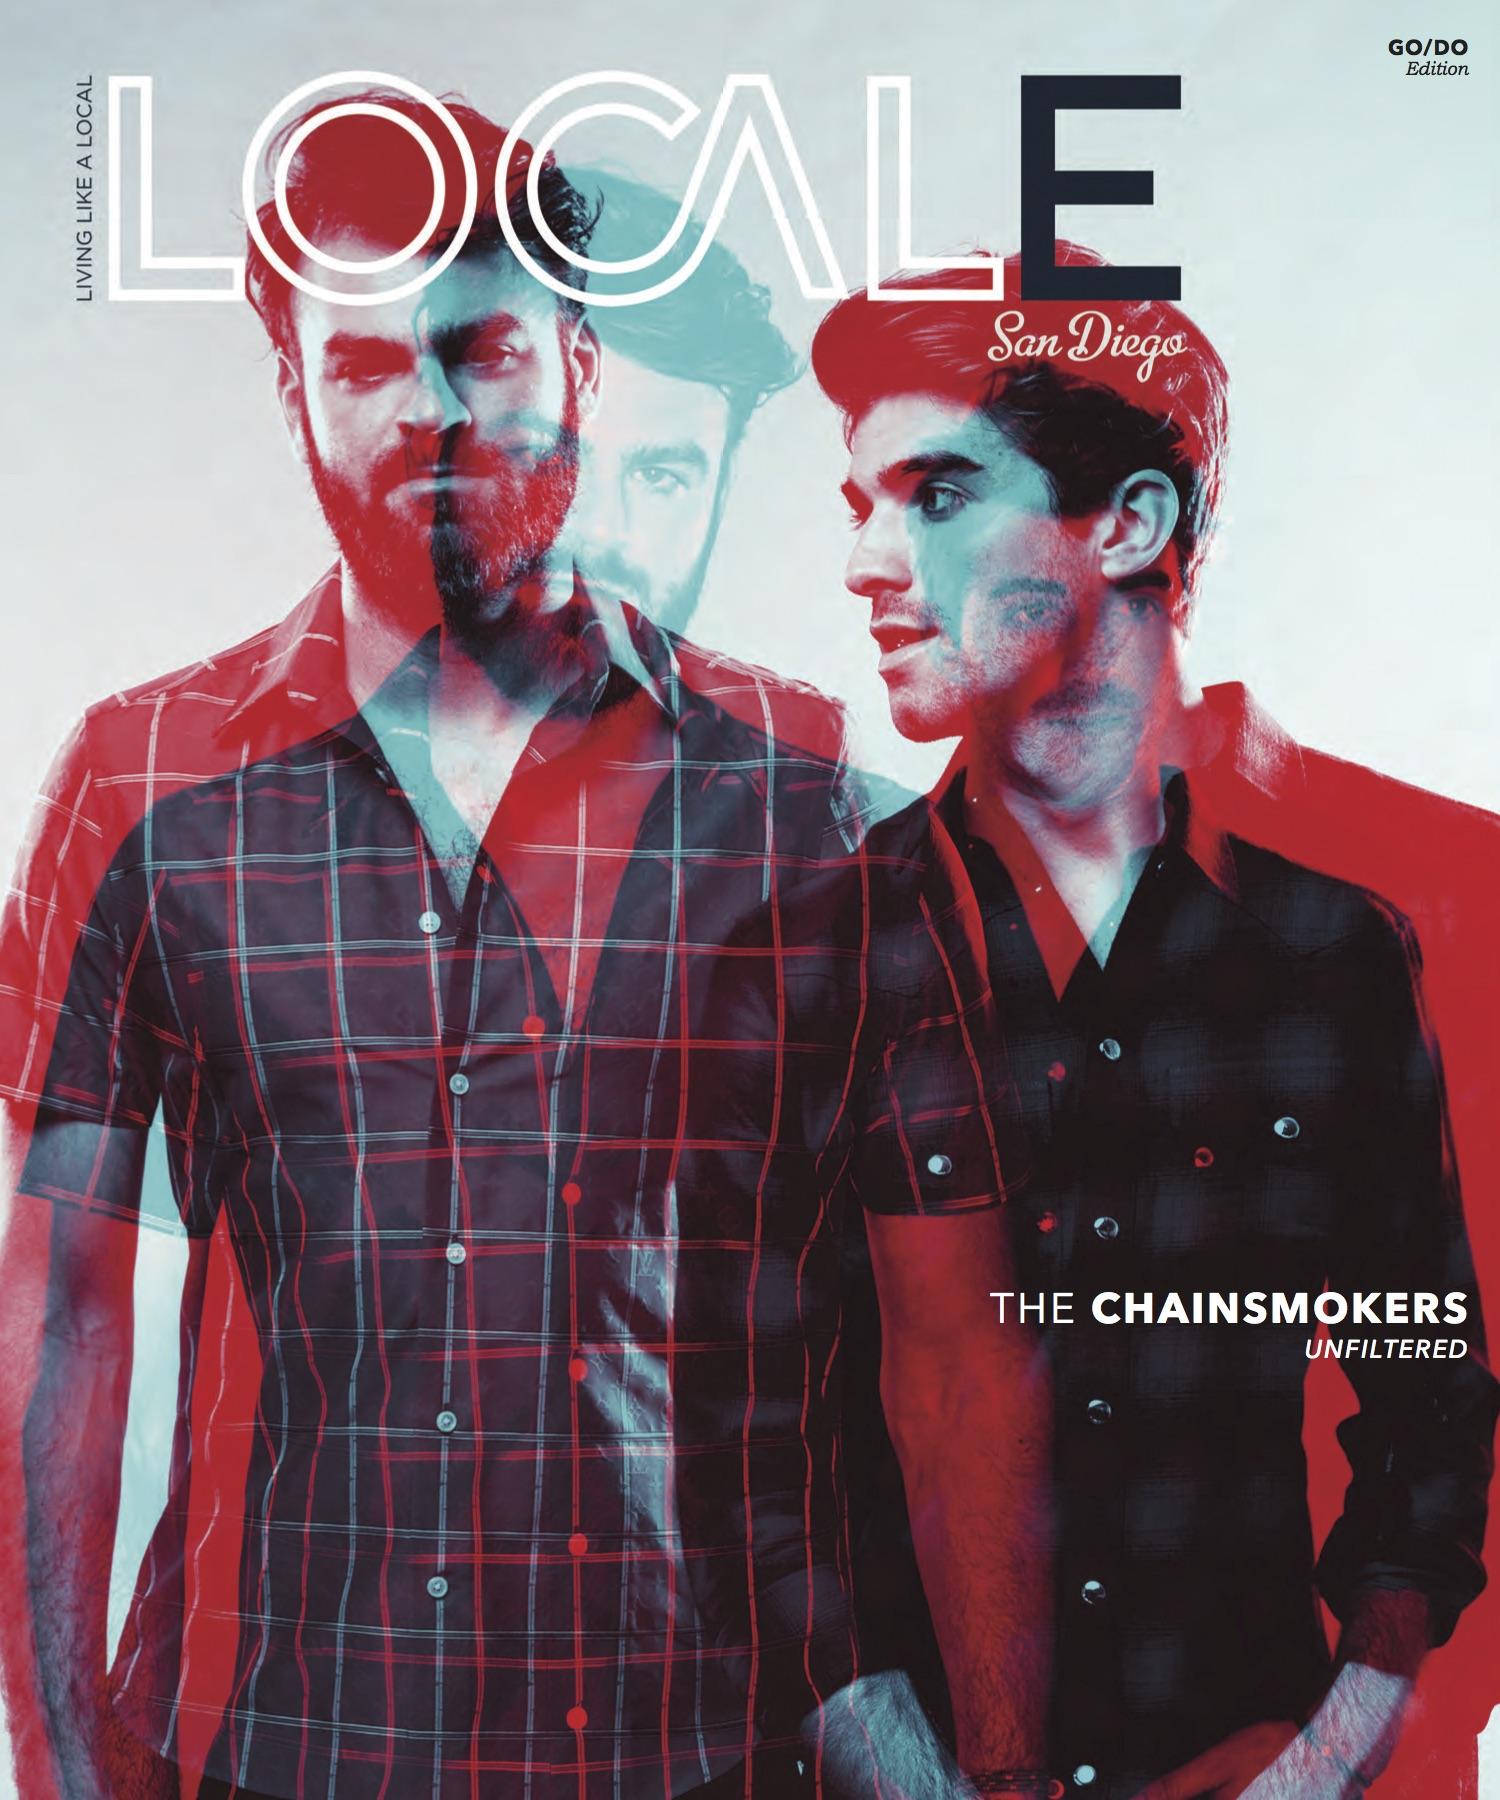 Chainsmokers_Cover.jpg